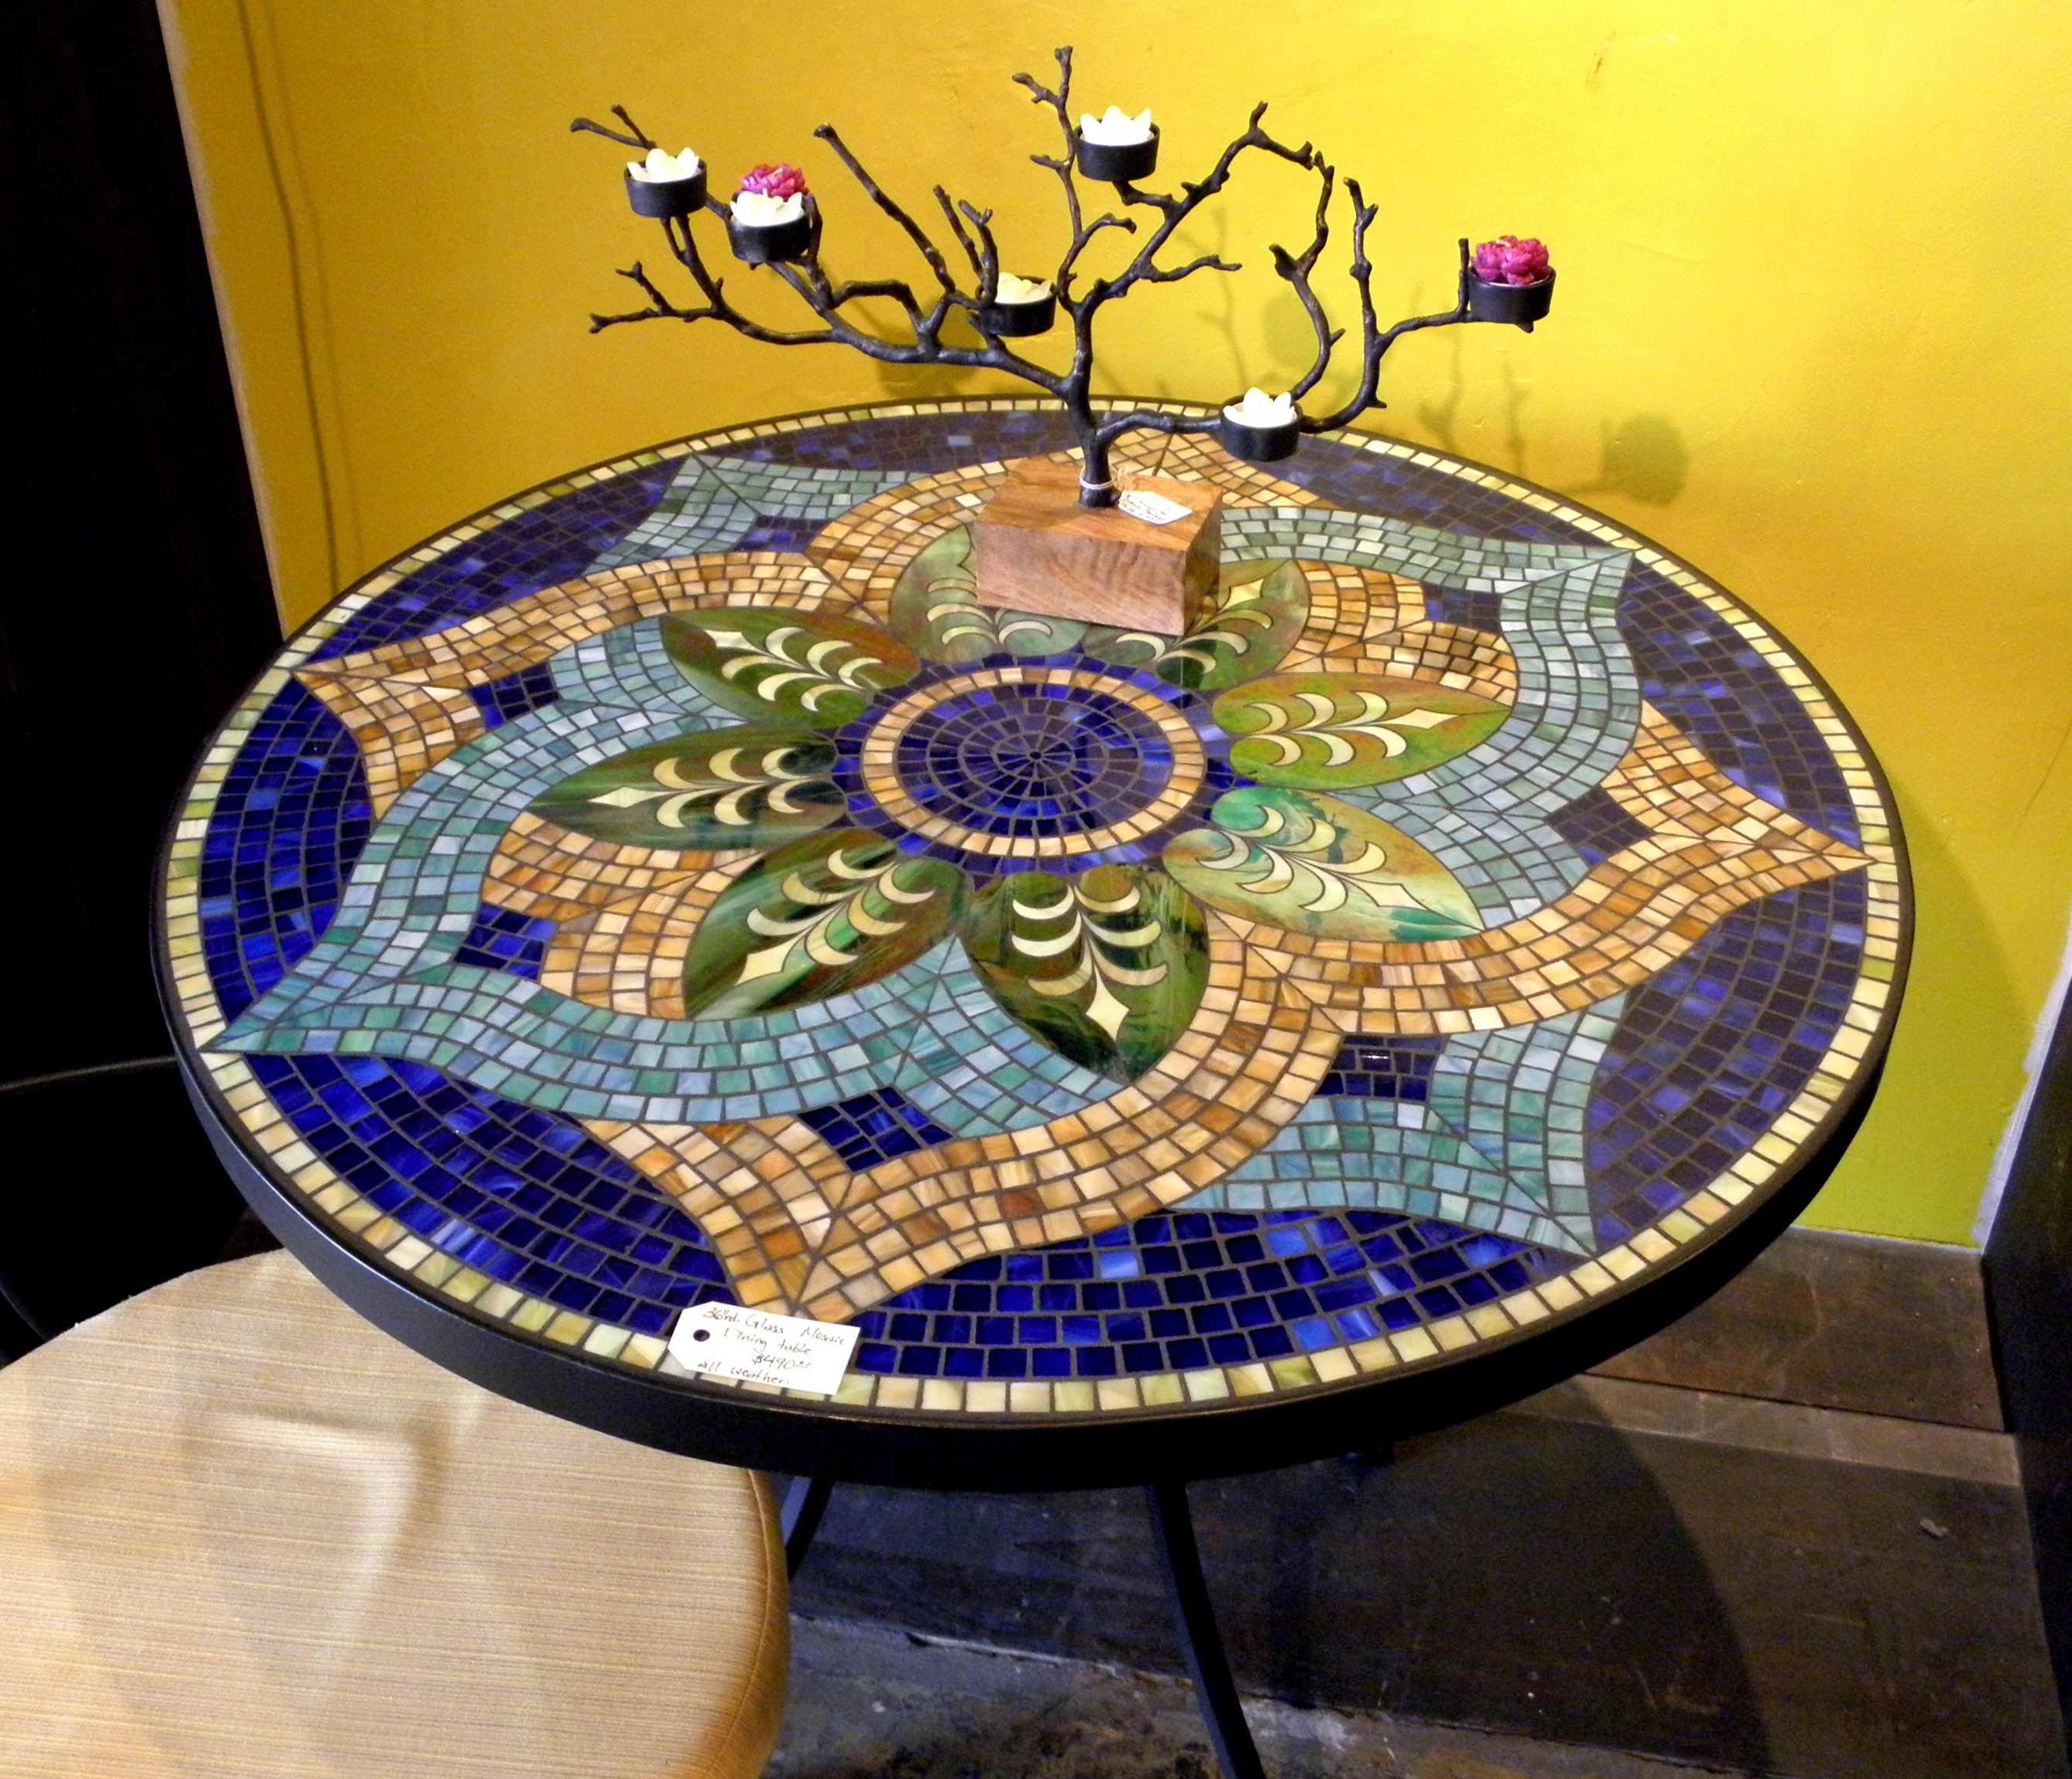 Mosaic Tile Table Patterns